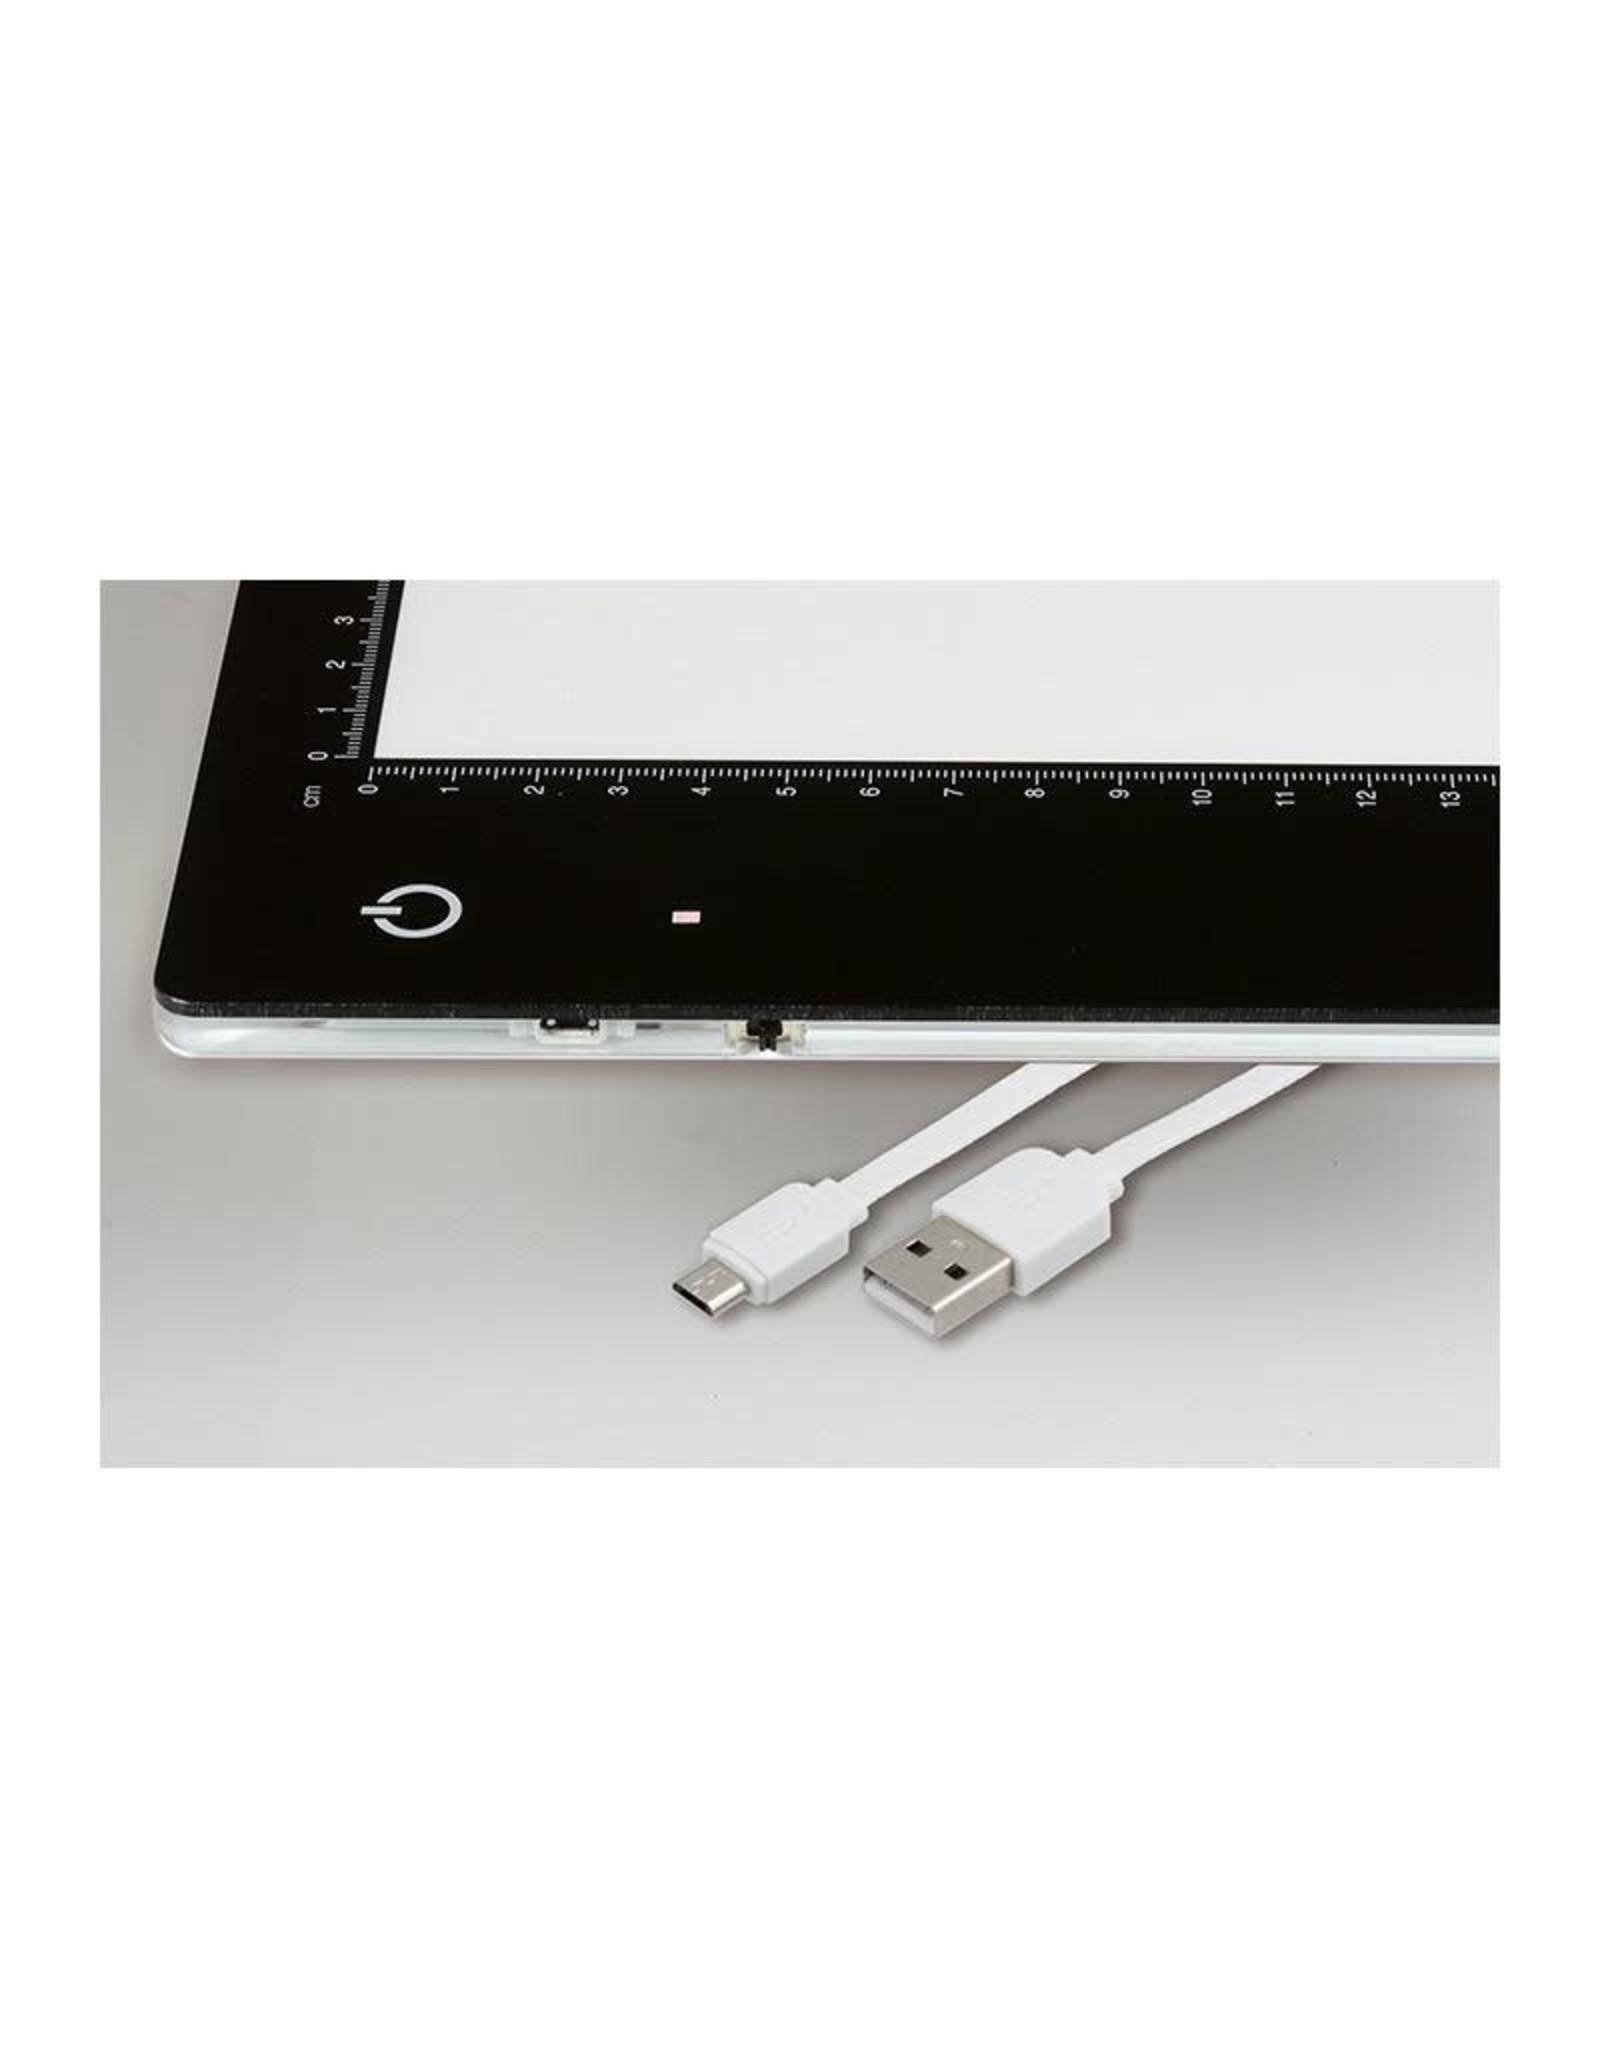 Kaiser Kaiser Slimlite Plano LED Lightbox 5000 K,  dimmable, mains or battery operation, incl. mains adapter / charger